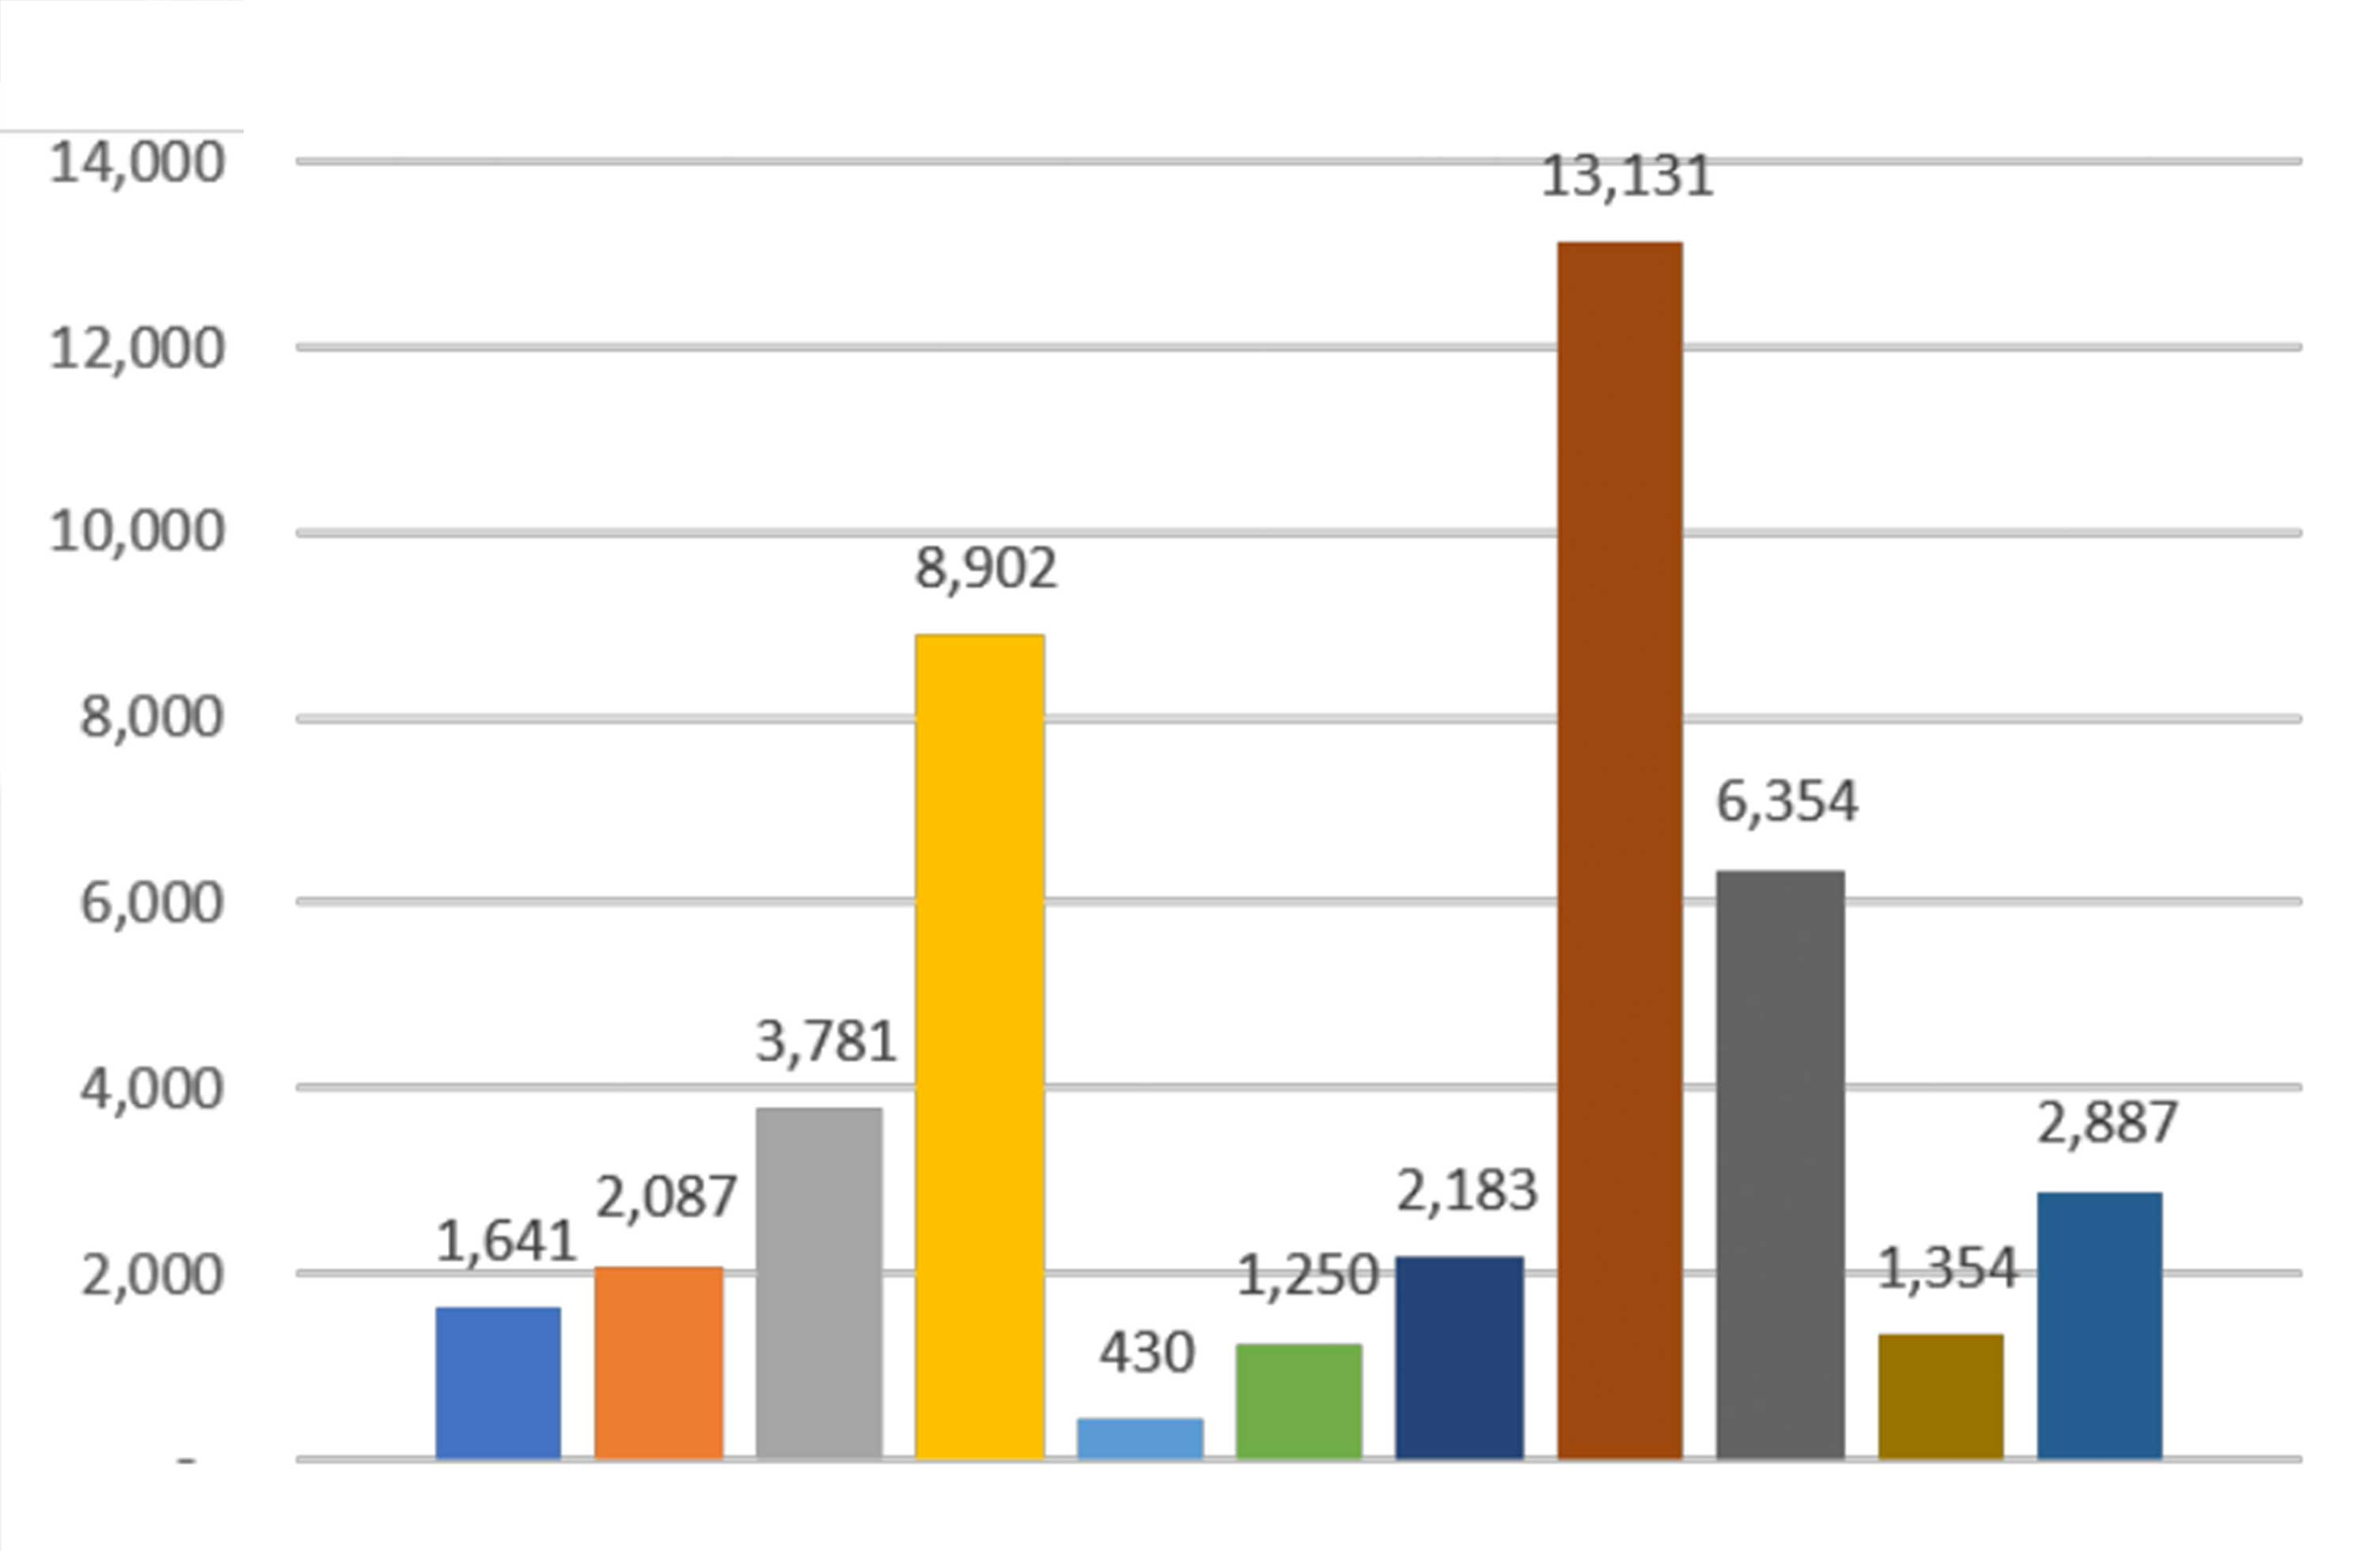 colorful bar graph